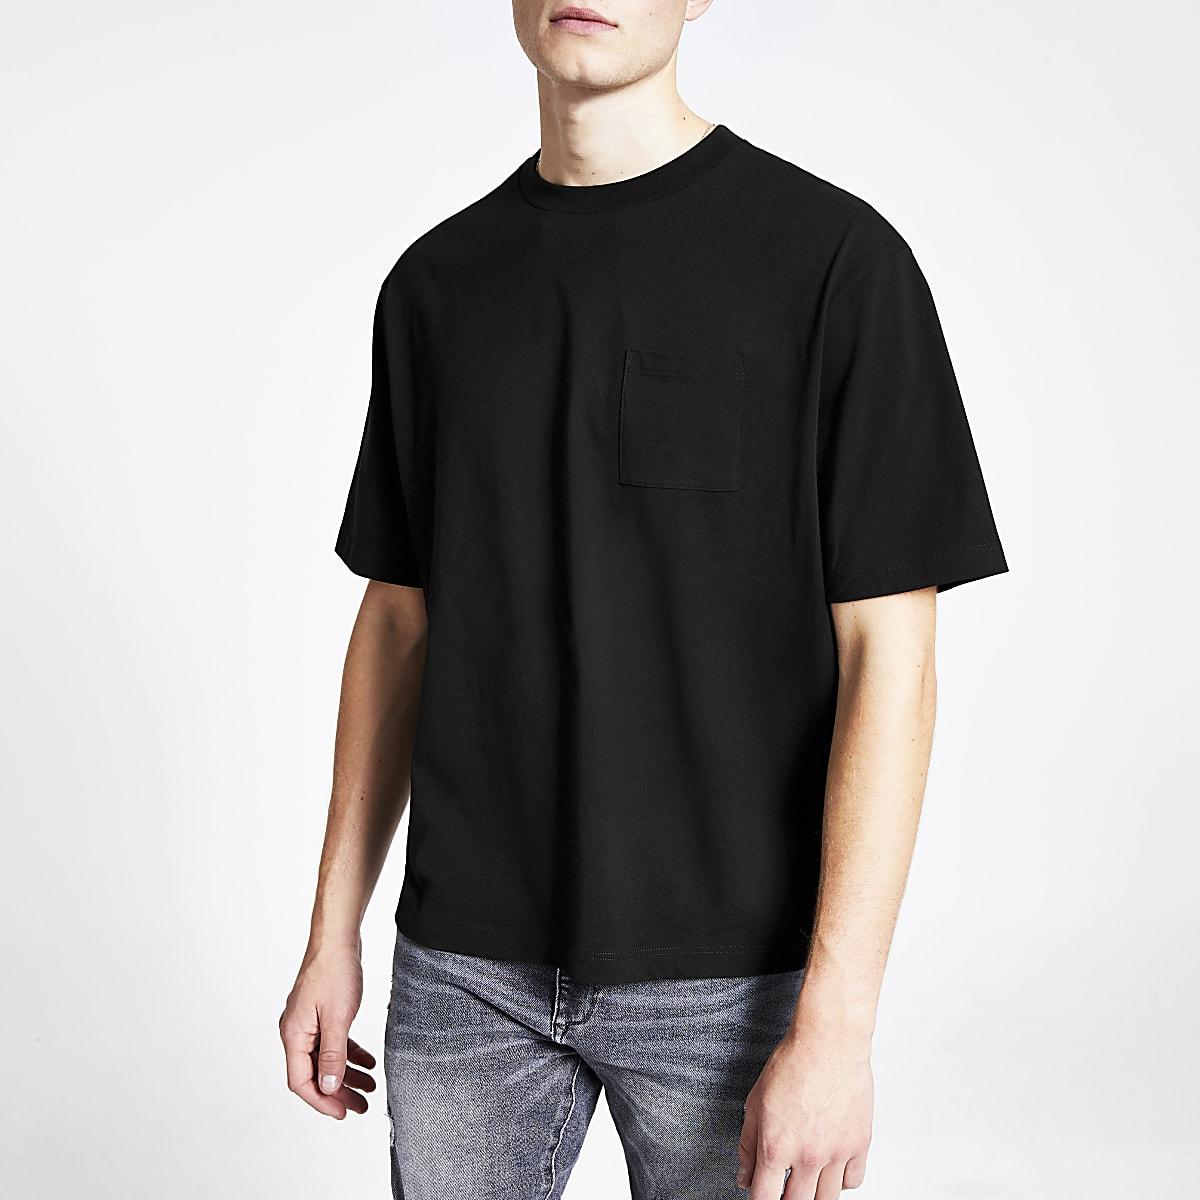 Black short sleeve boxy T-shirt